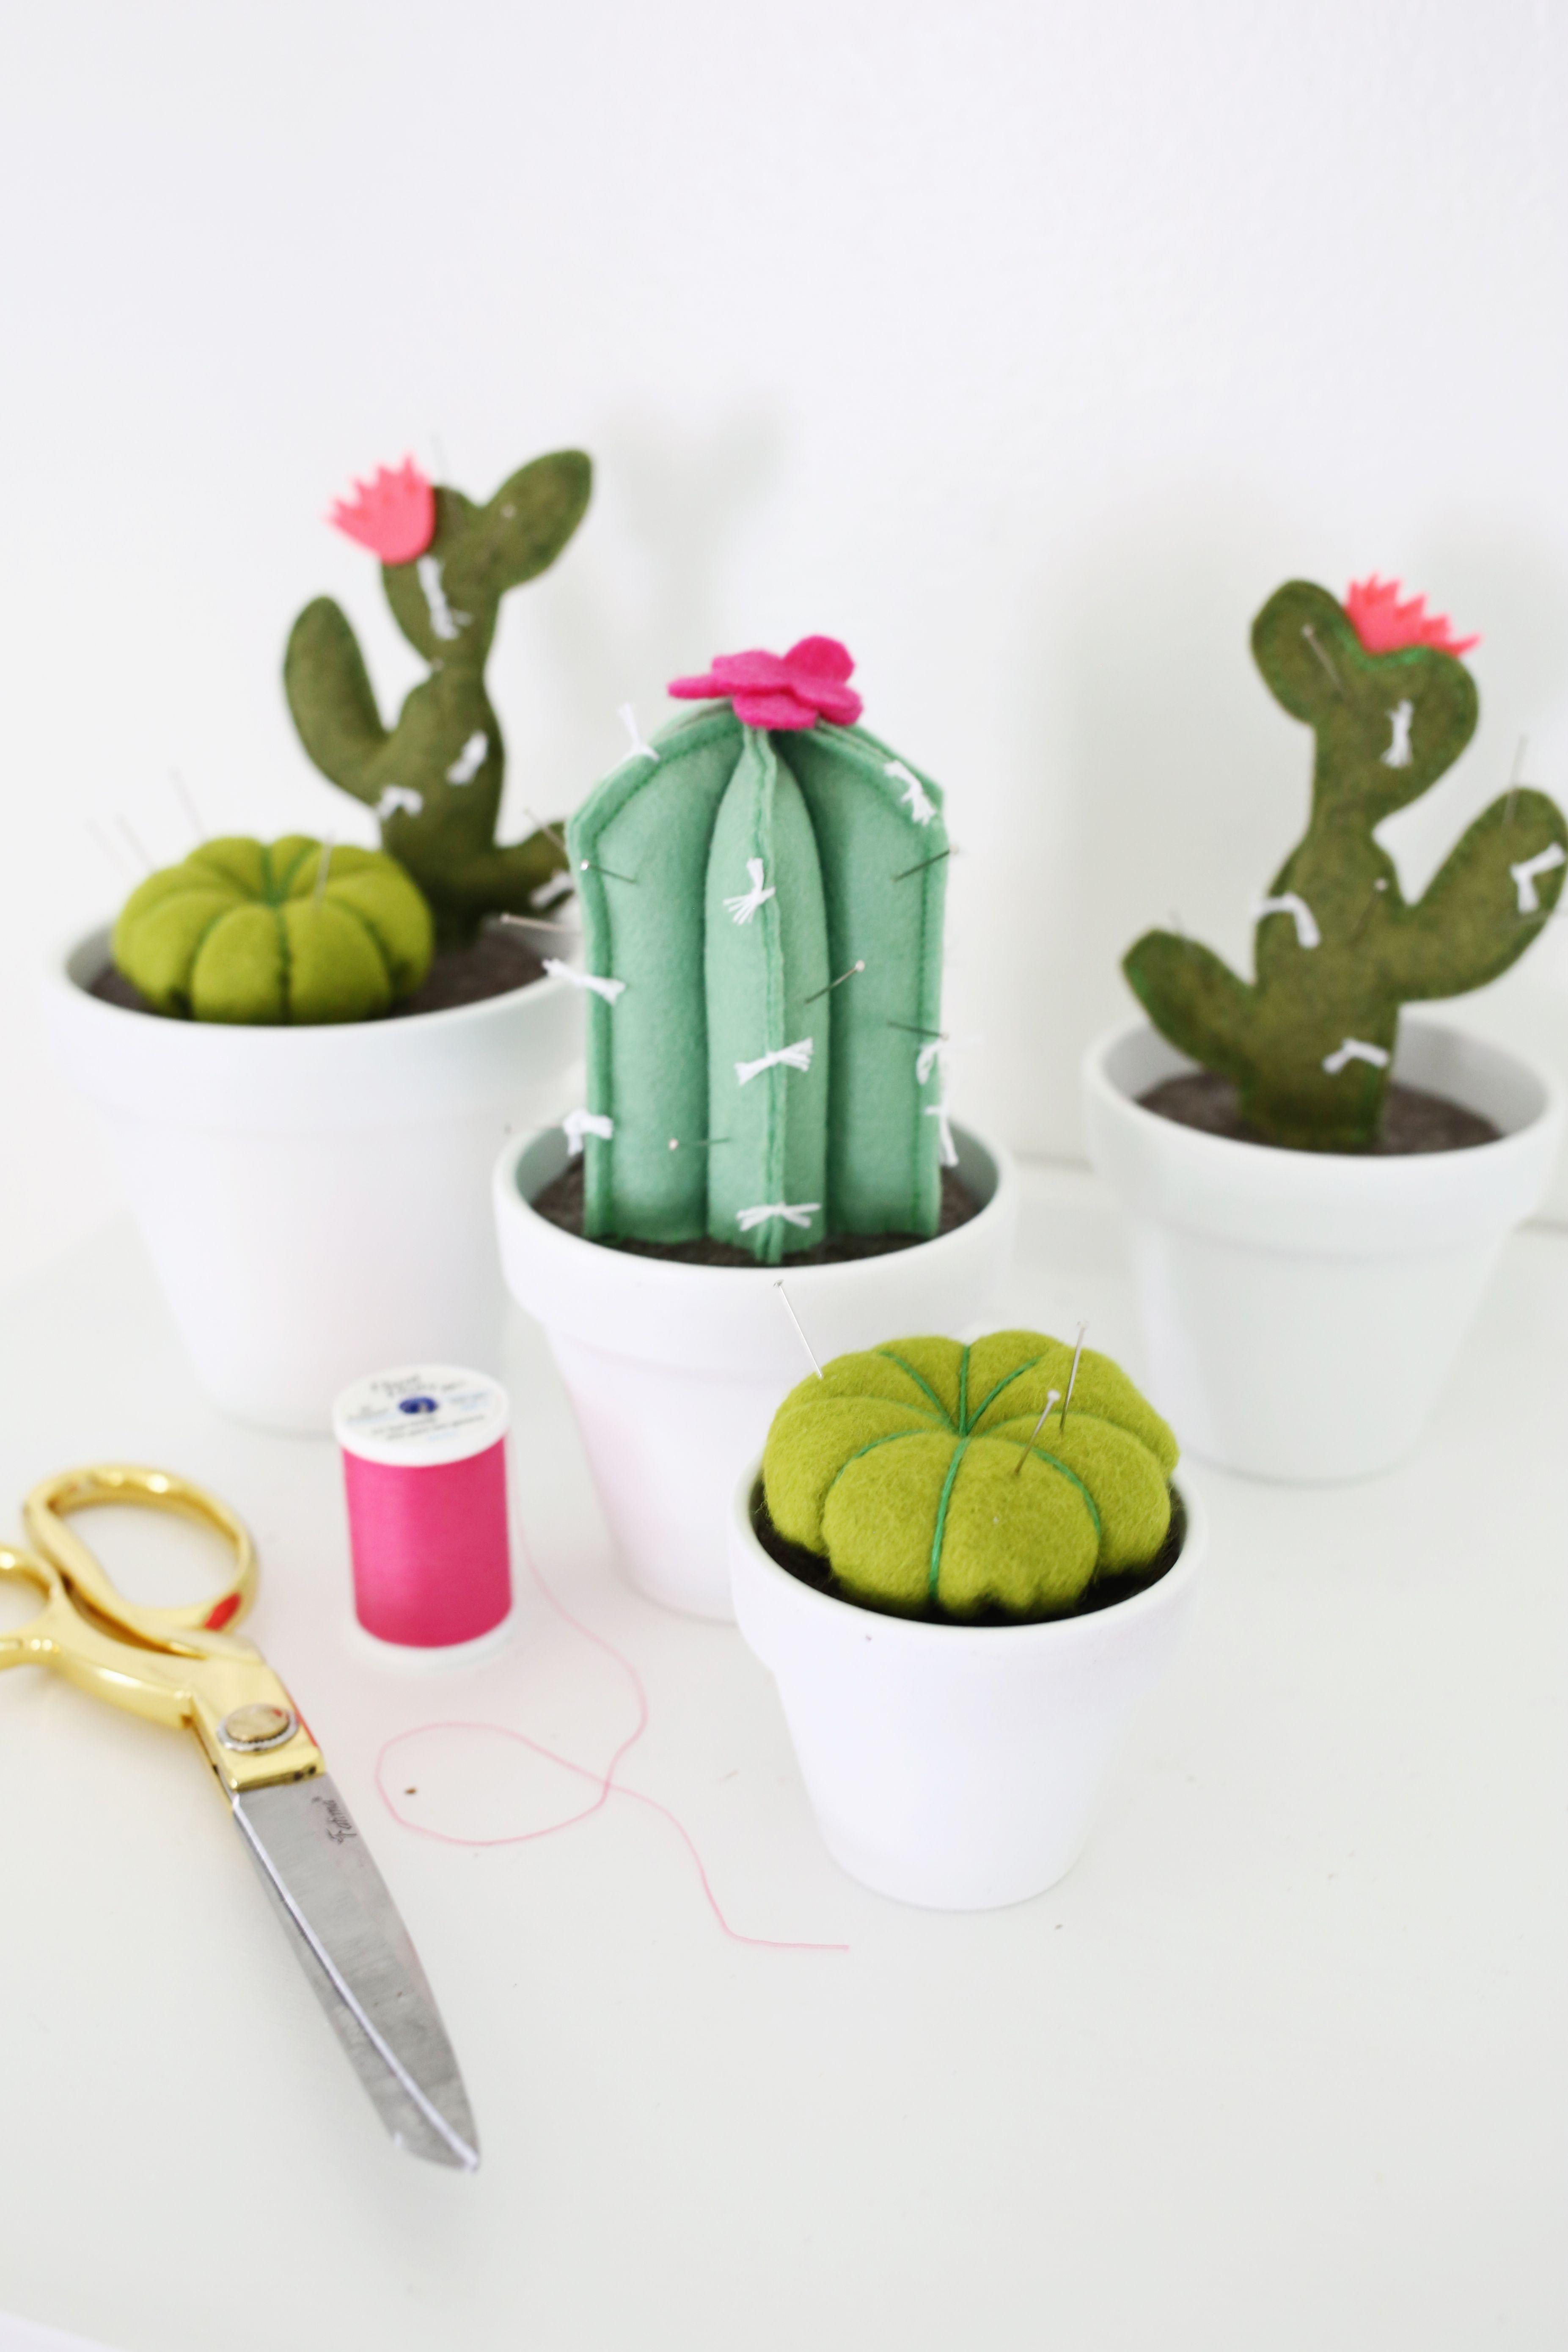 Cactus Pincushion DIY Costura Paos y Coser